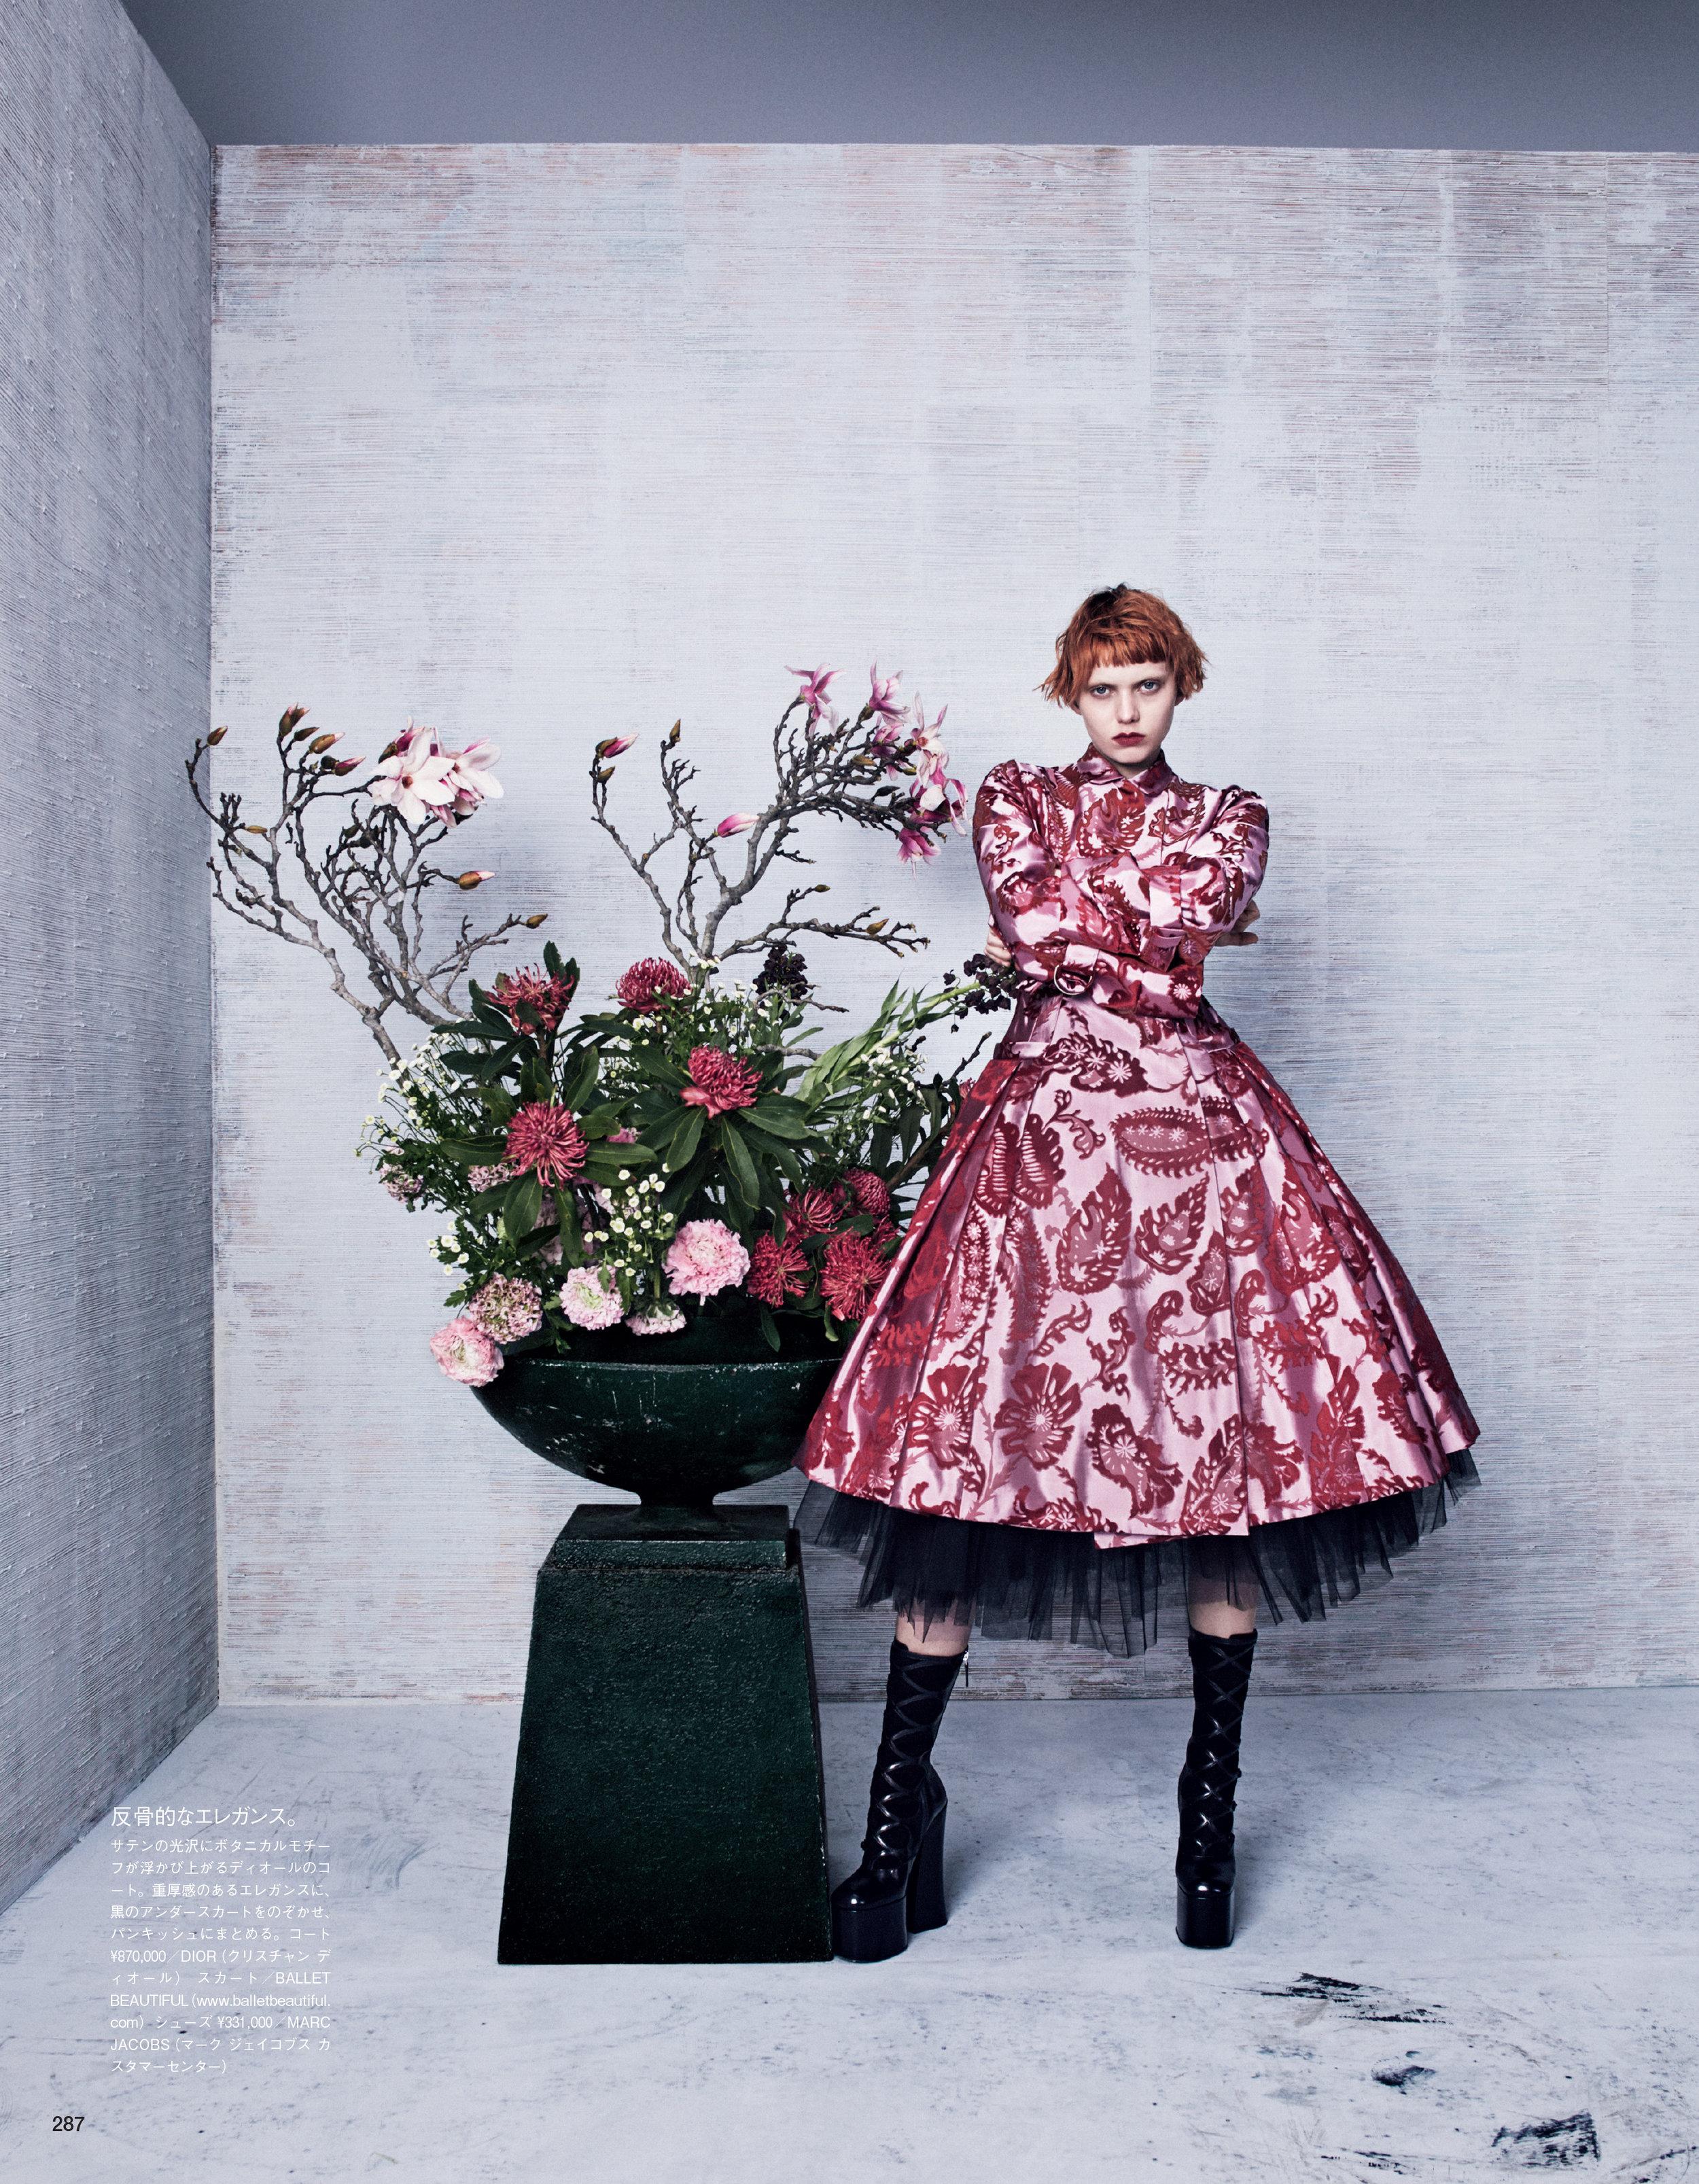 Giovanna-Battaglia_Flowers-of-Romance_Vogue-Japan_January-2017_Emma-Summerton_2.jpg